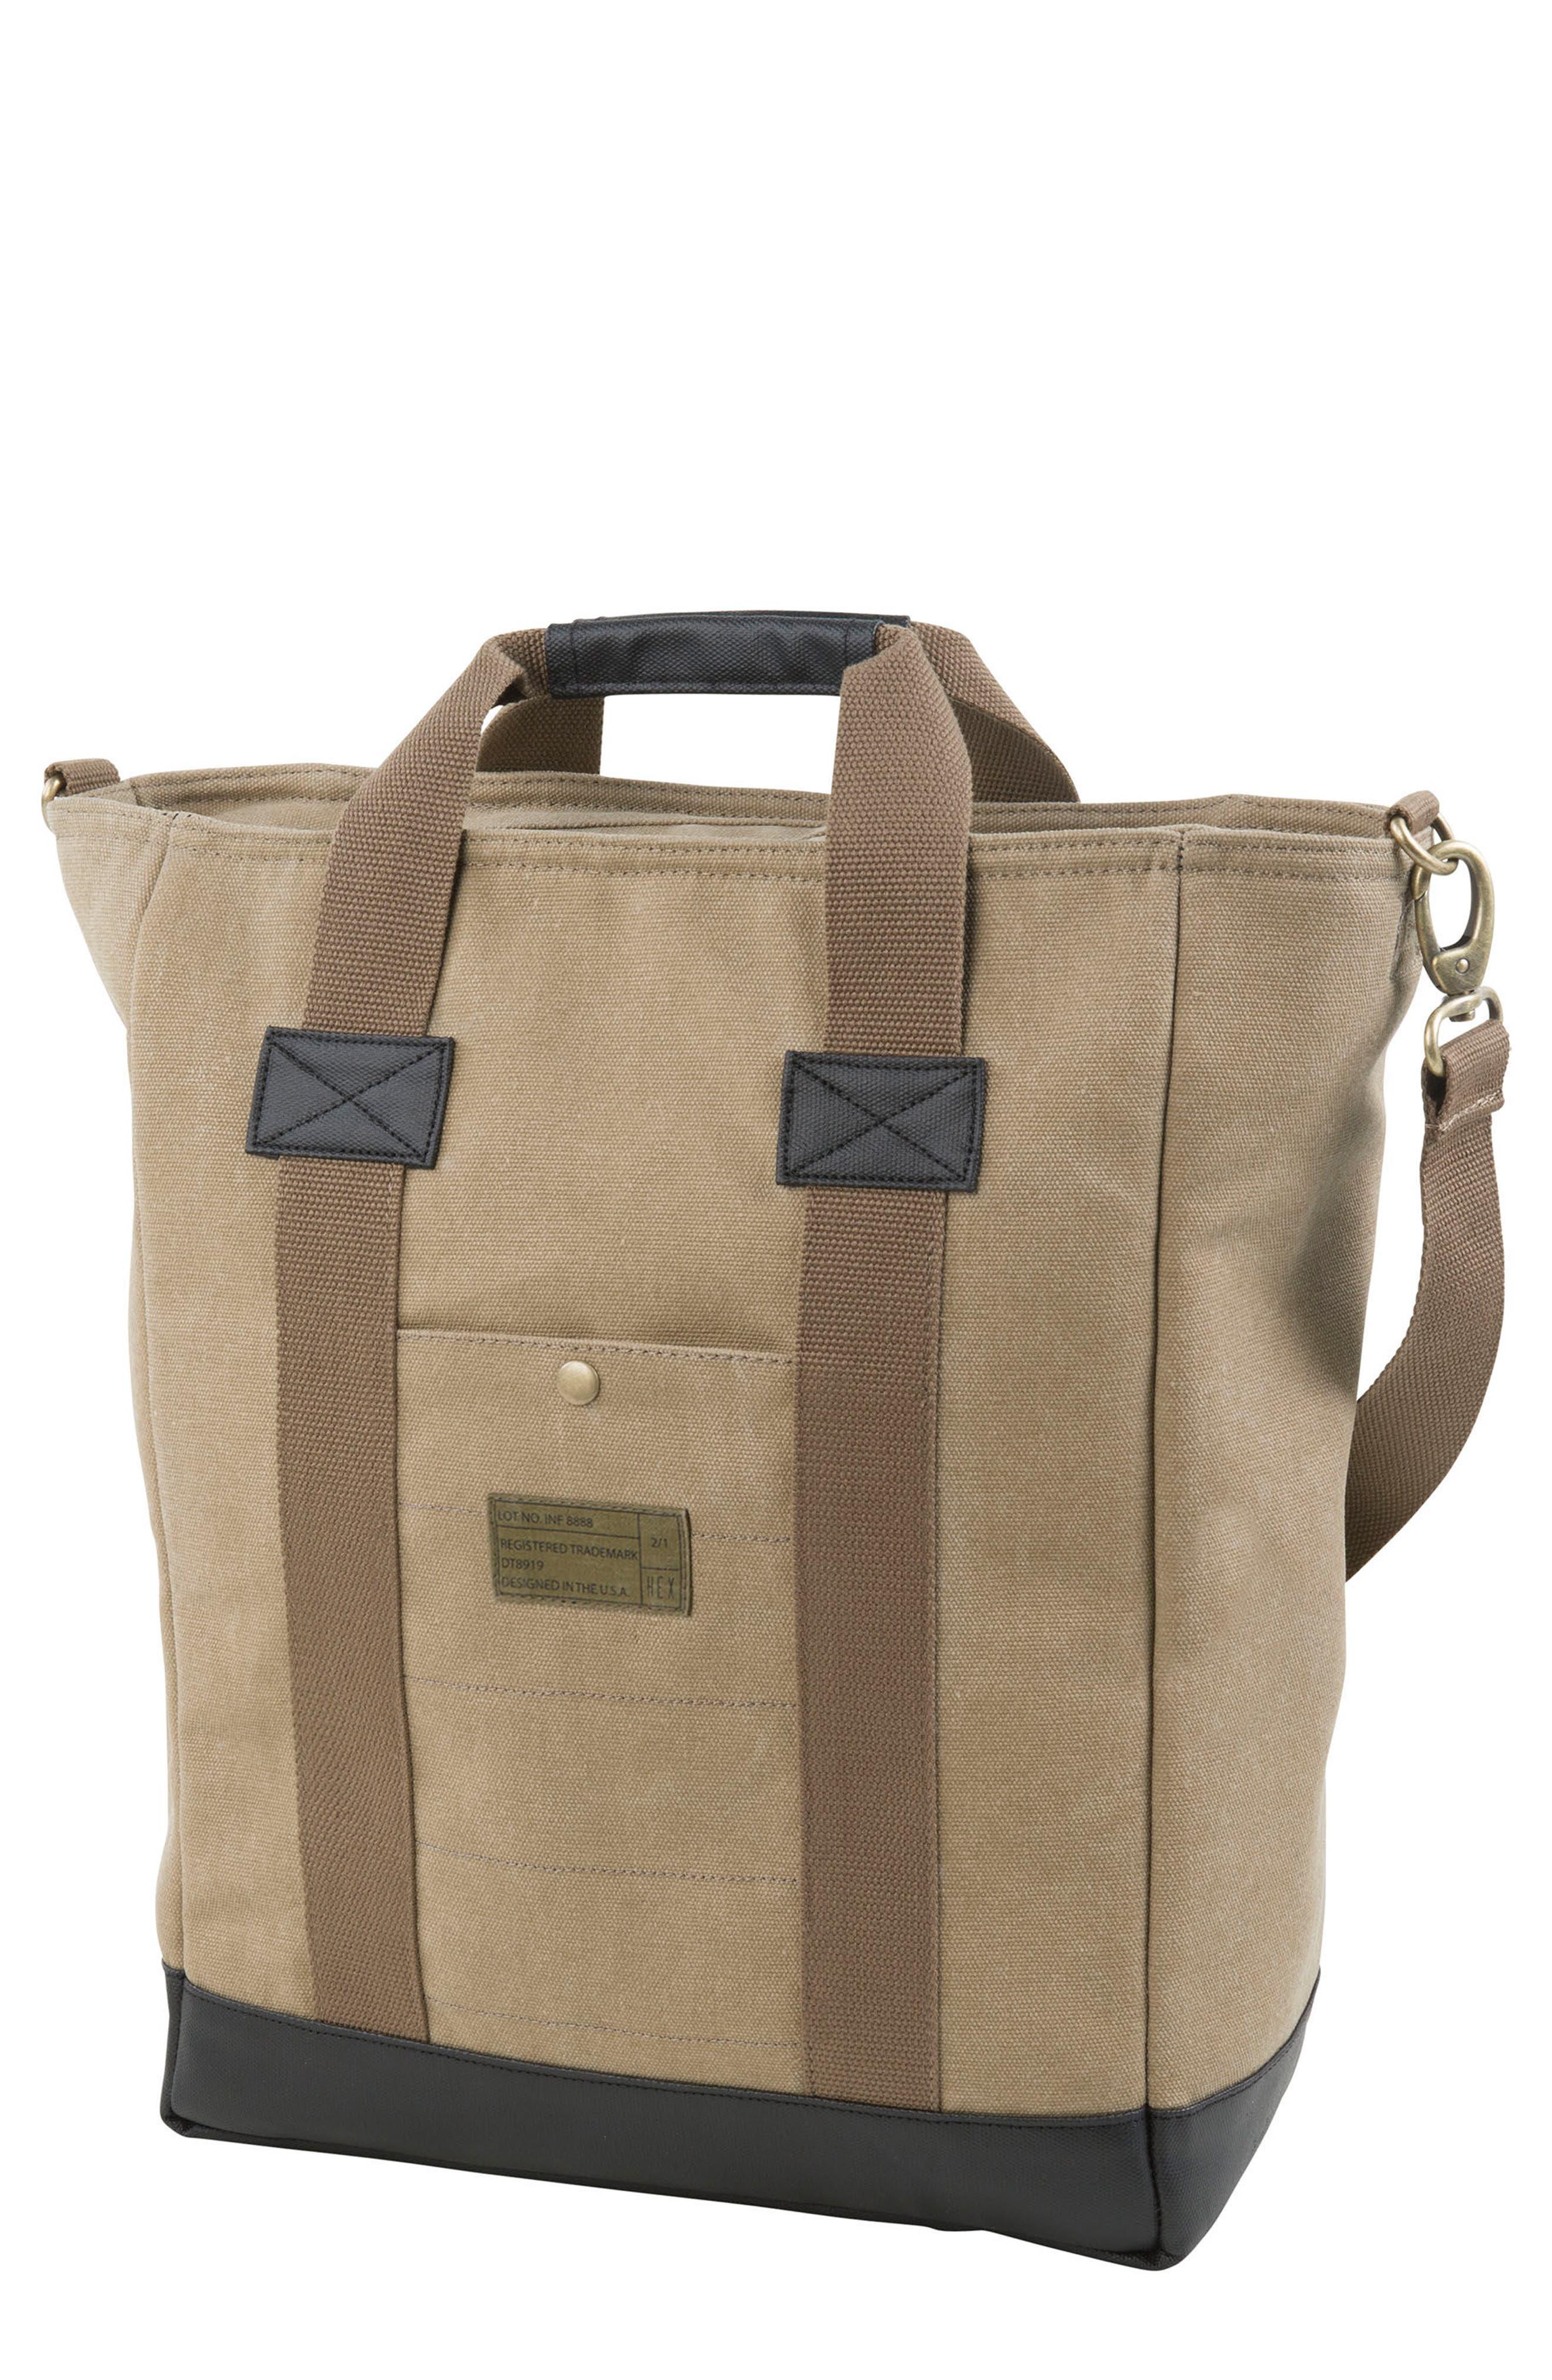 HEX Canvas Tote Bag